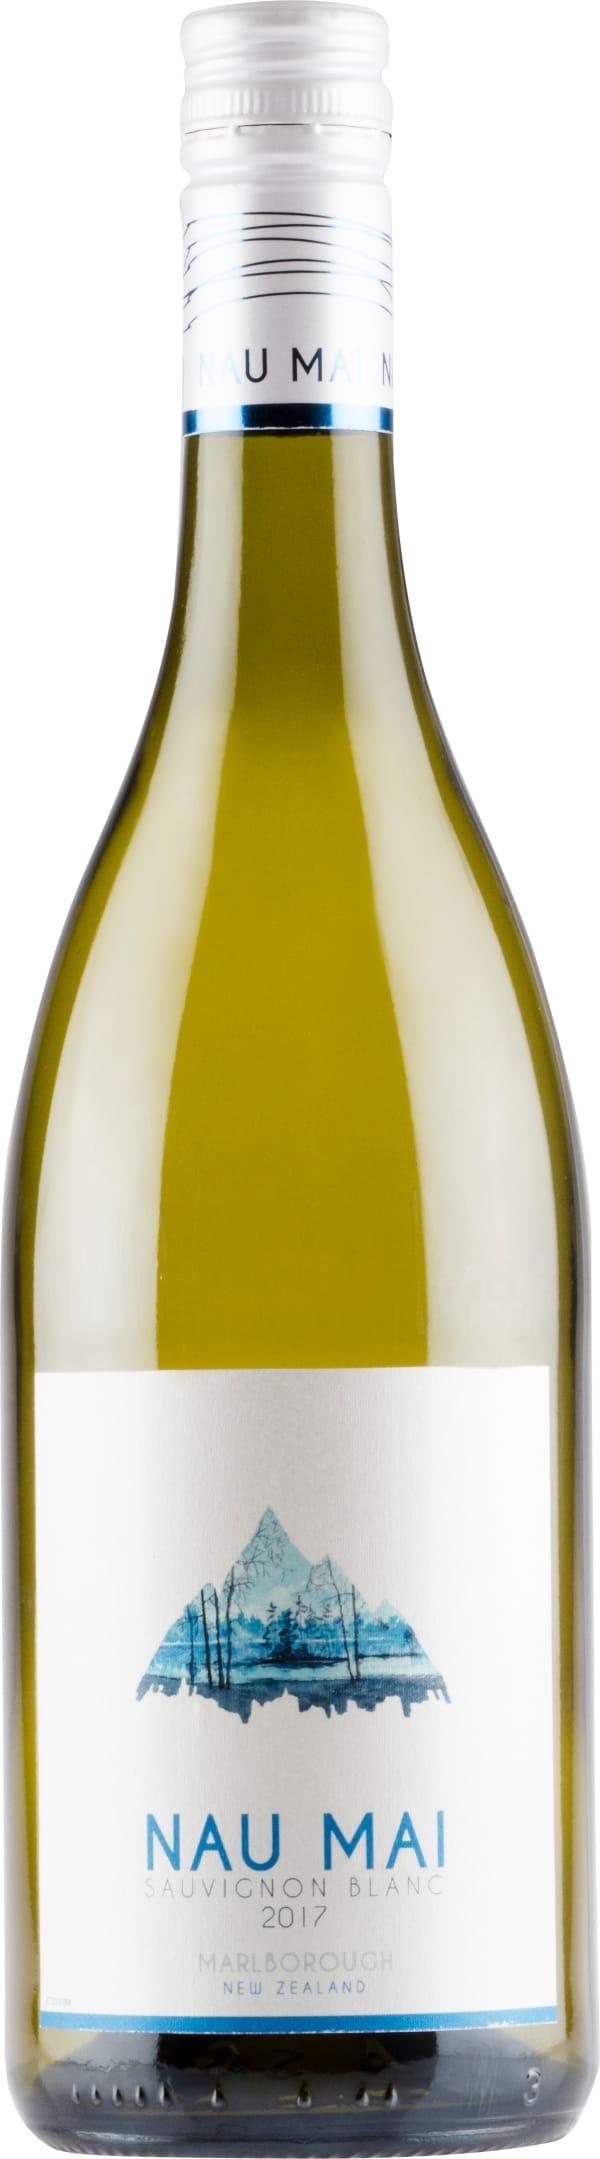 Nau Mai Sauvignon Blanc 2019